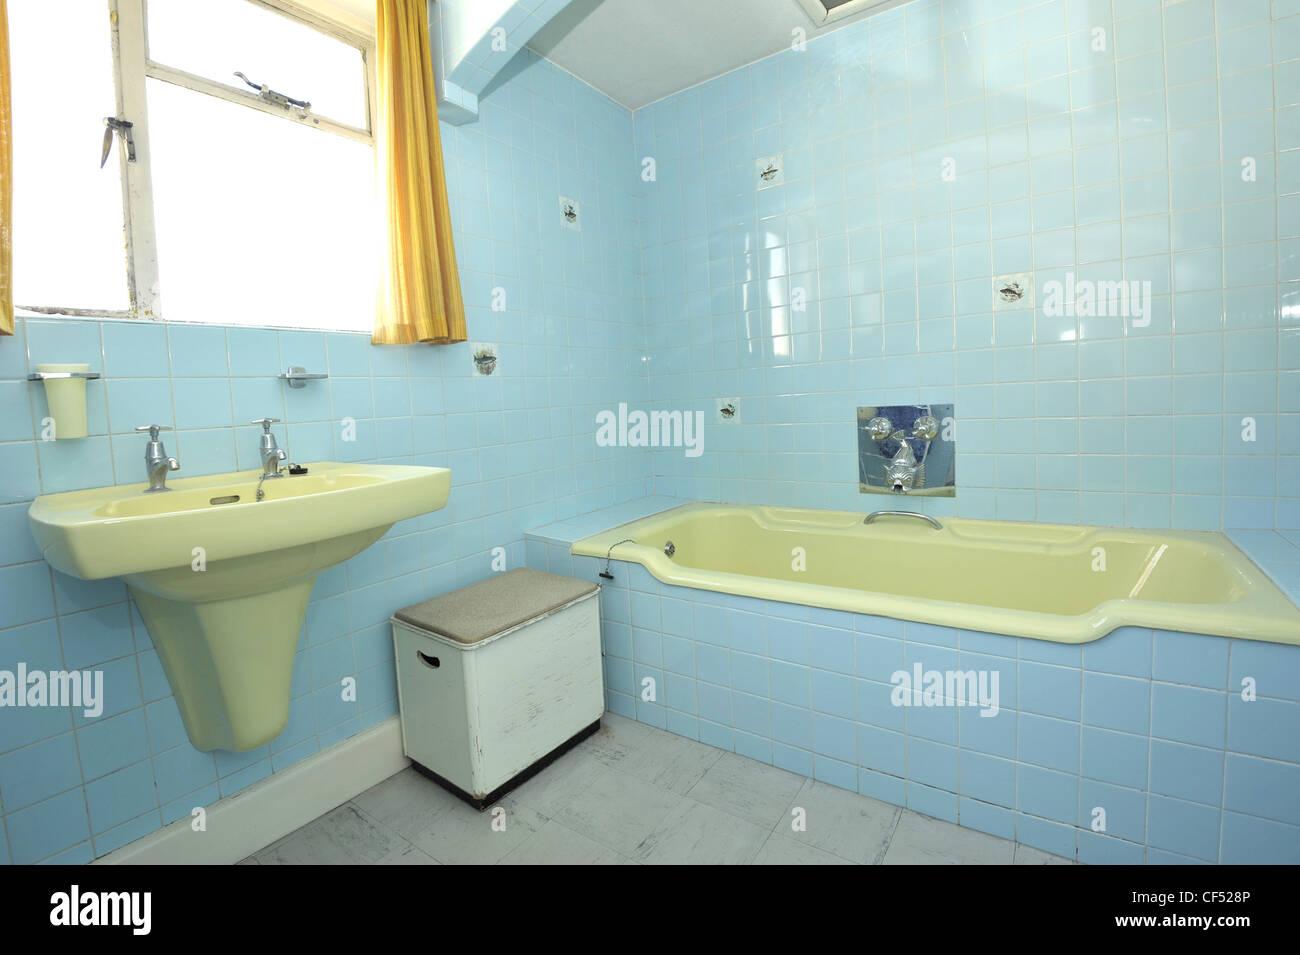 Old Fashioned Tiling Photos Model - Bathtub Ideas - dilata.info